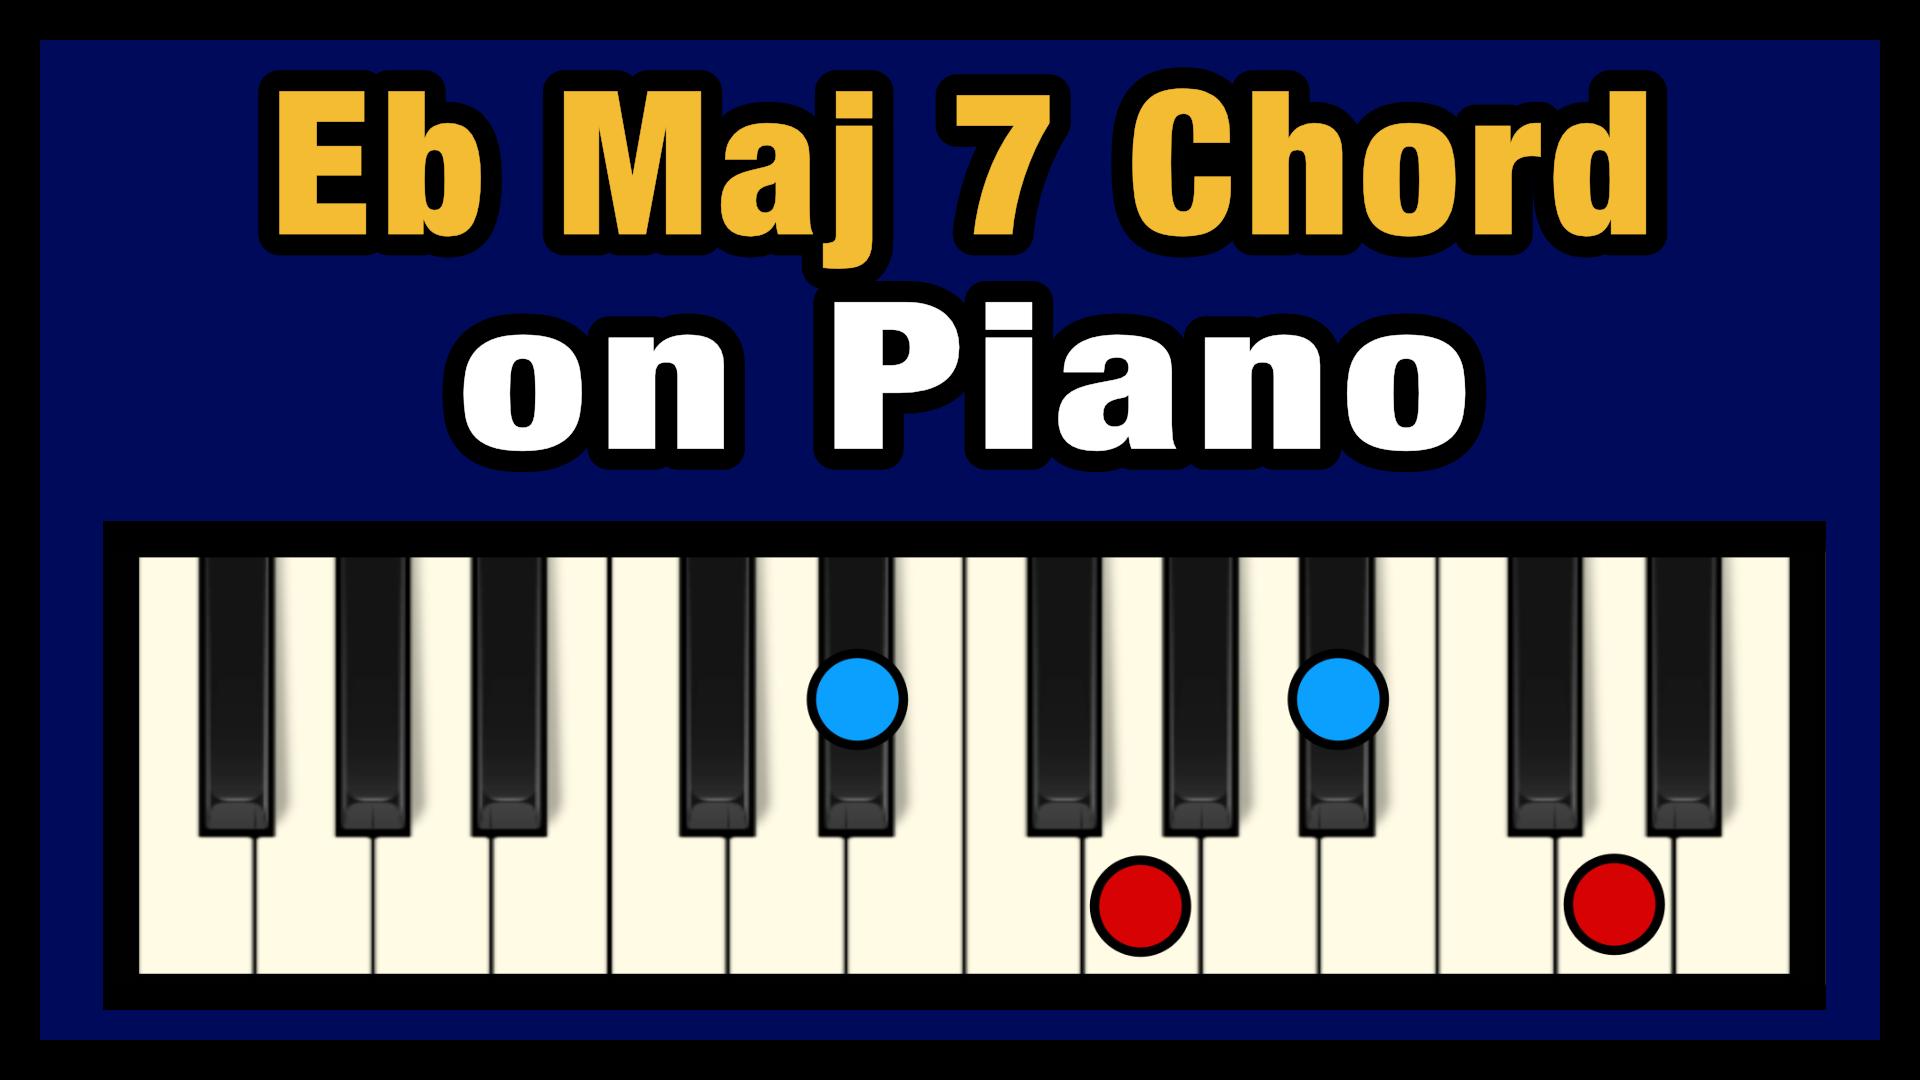 Eb Maj 15 Chord on Piano Free Chart – Professional Composers